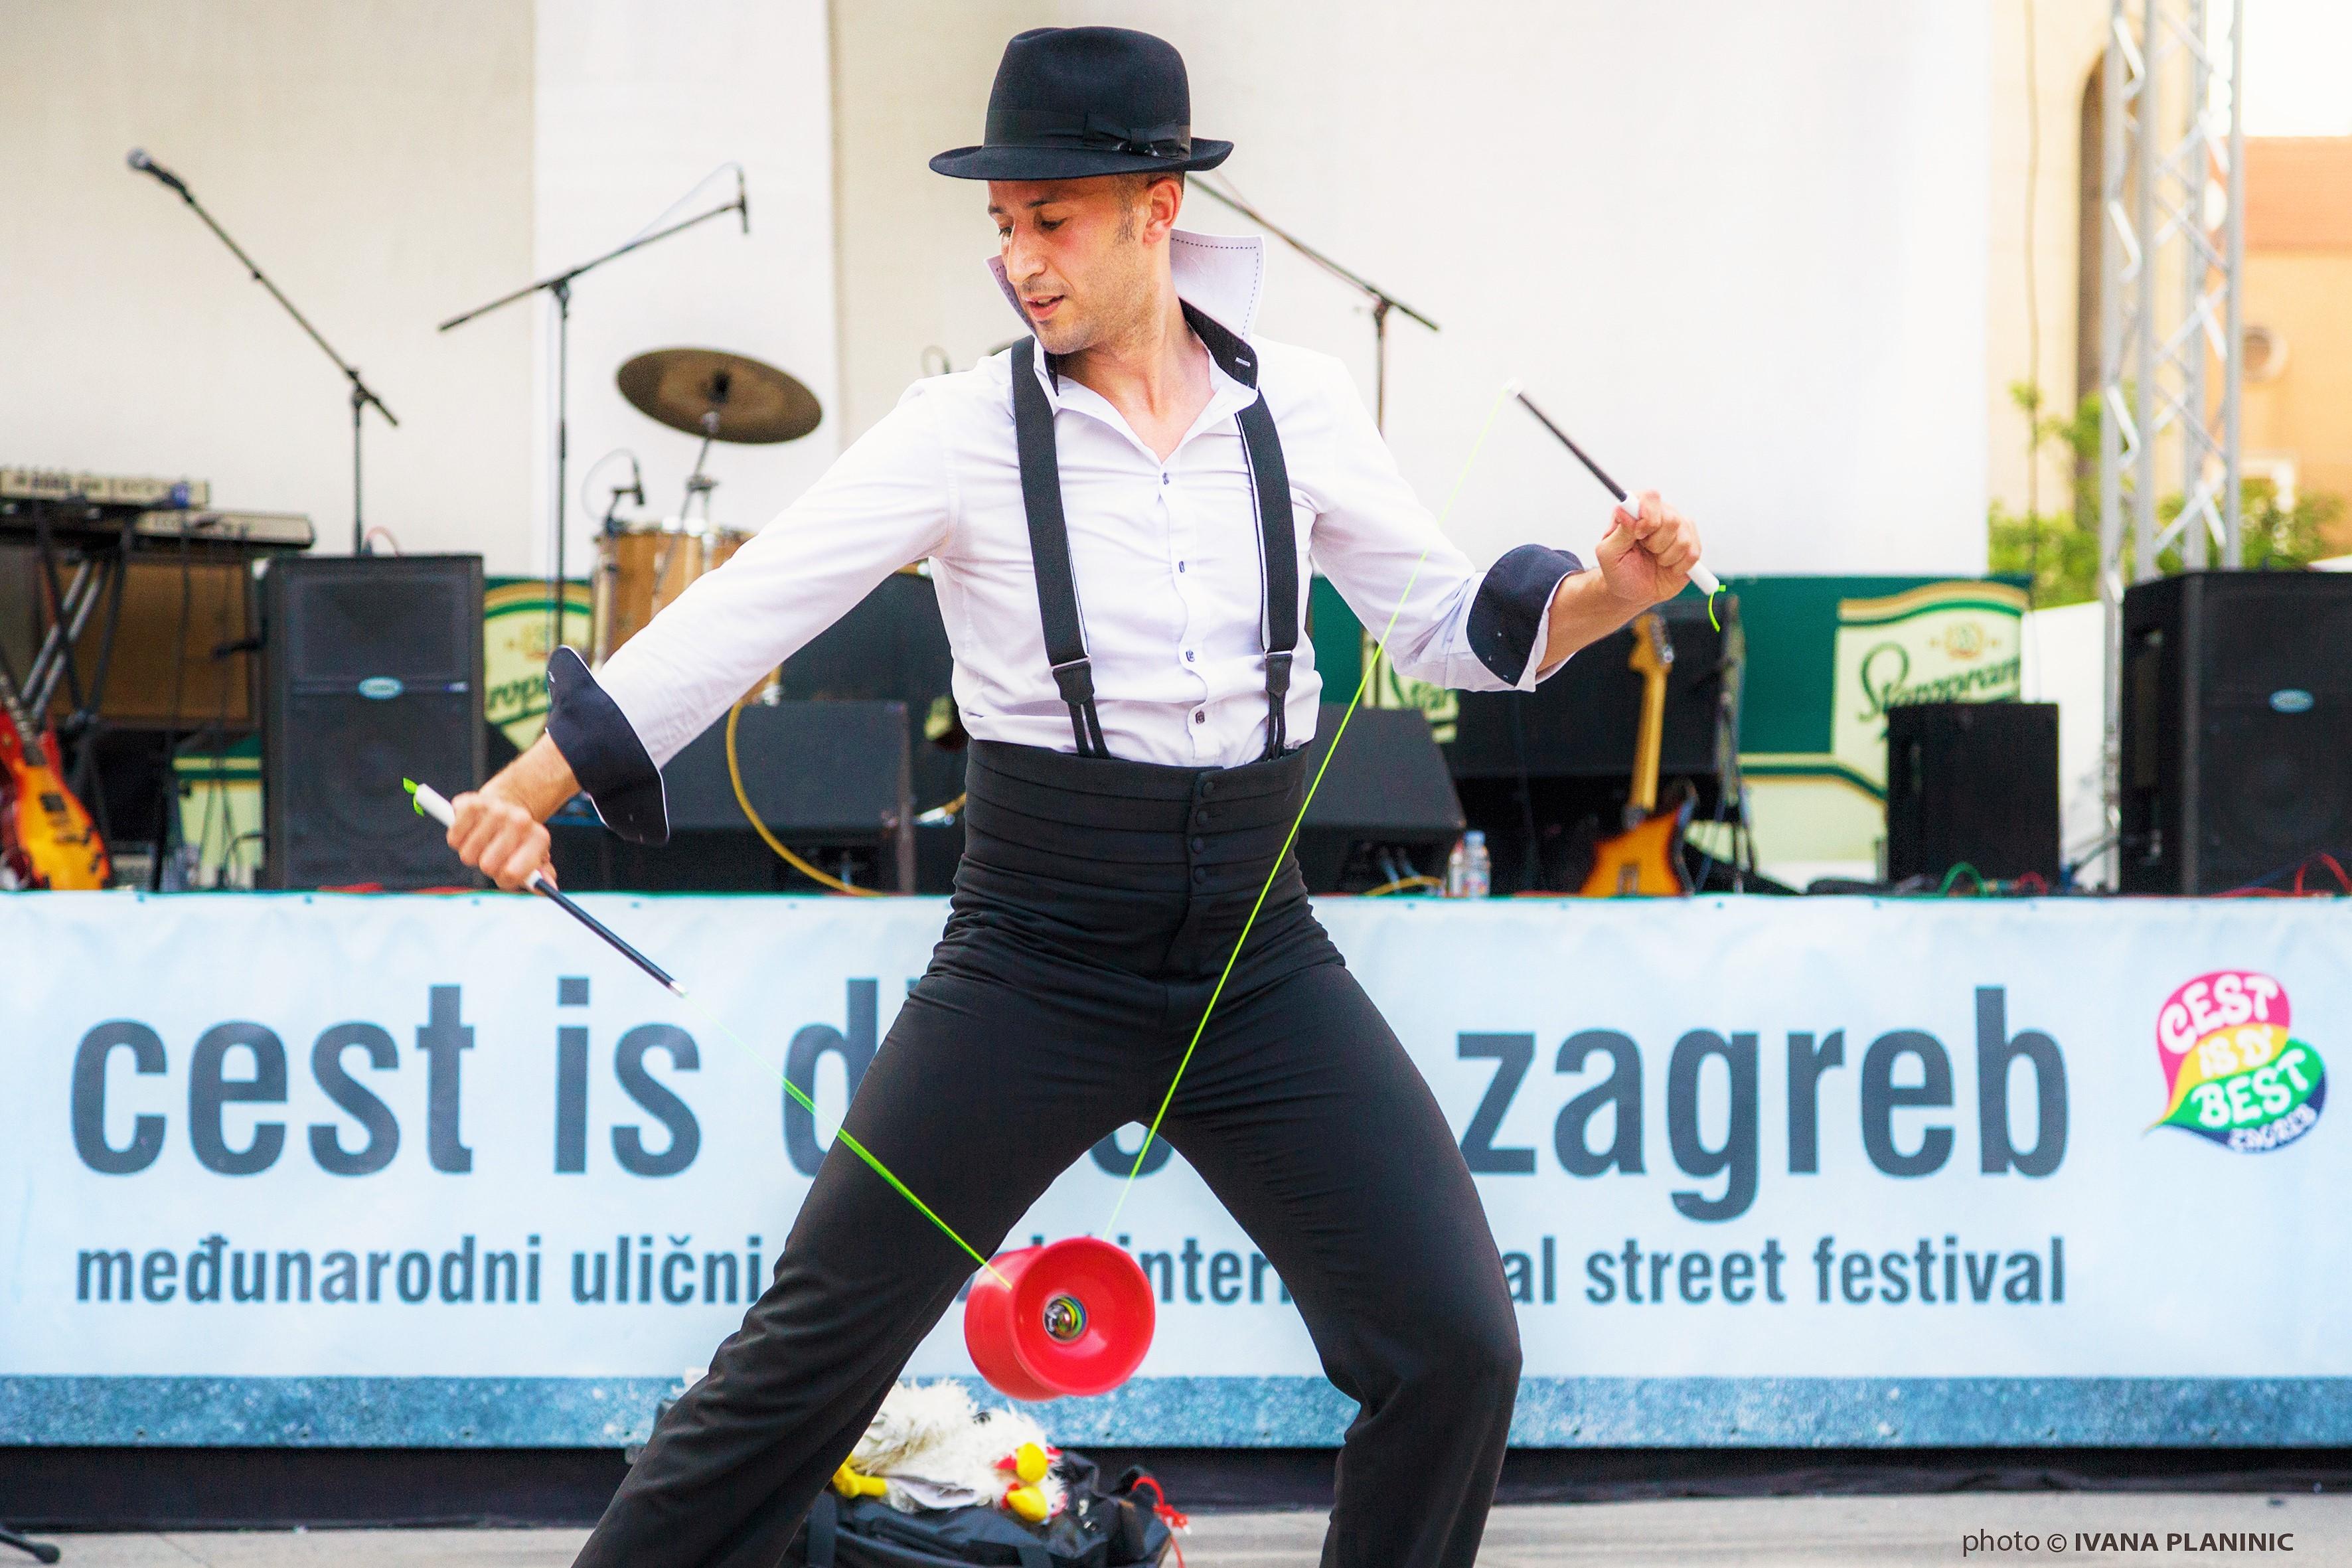 02_Mister F_Cest is d best_Zagreb_Croati